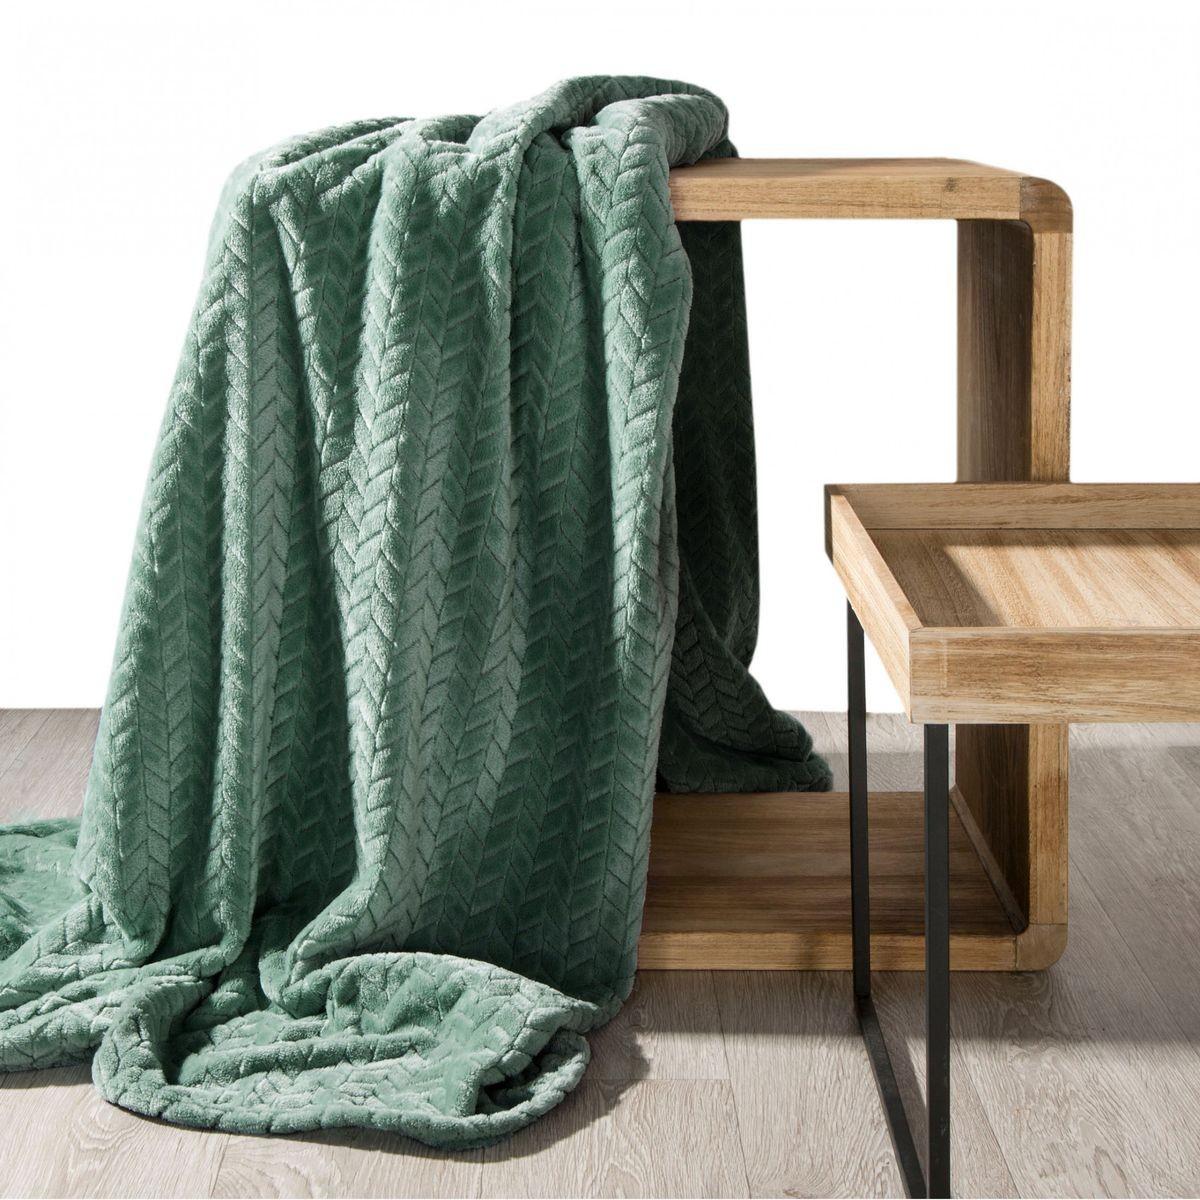 DomTextilu Príjemne mäkká deka mätovo zelenej farby 70 x 160 cm